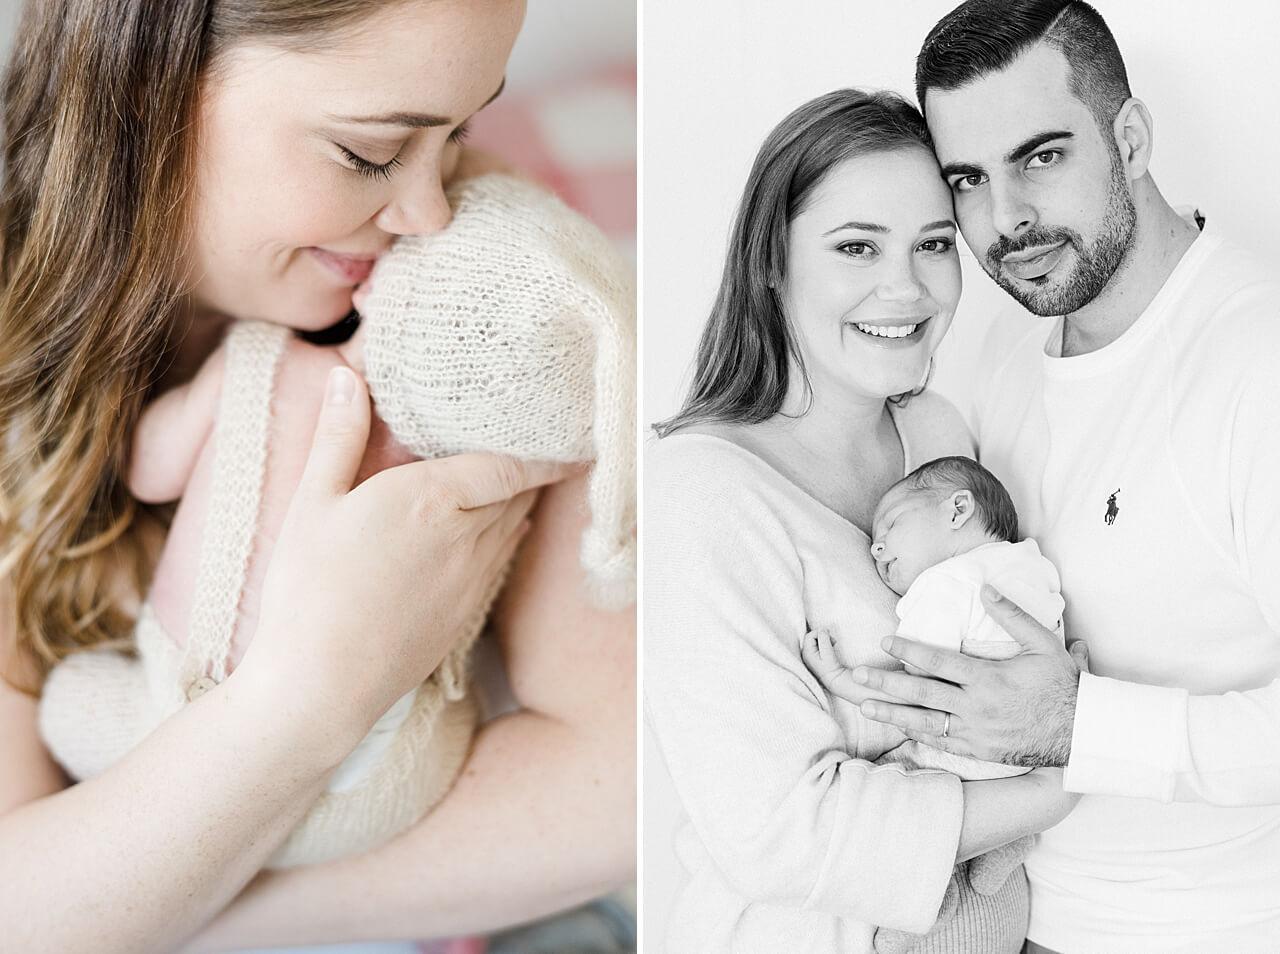 Rebecca Conte Fotografie: Wundervolles Newbornshooting 14